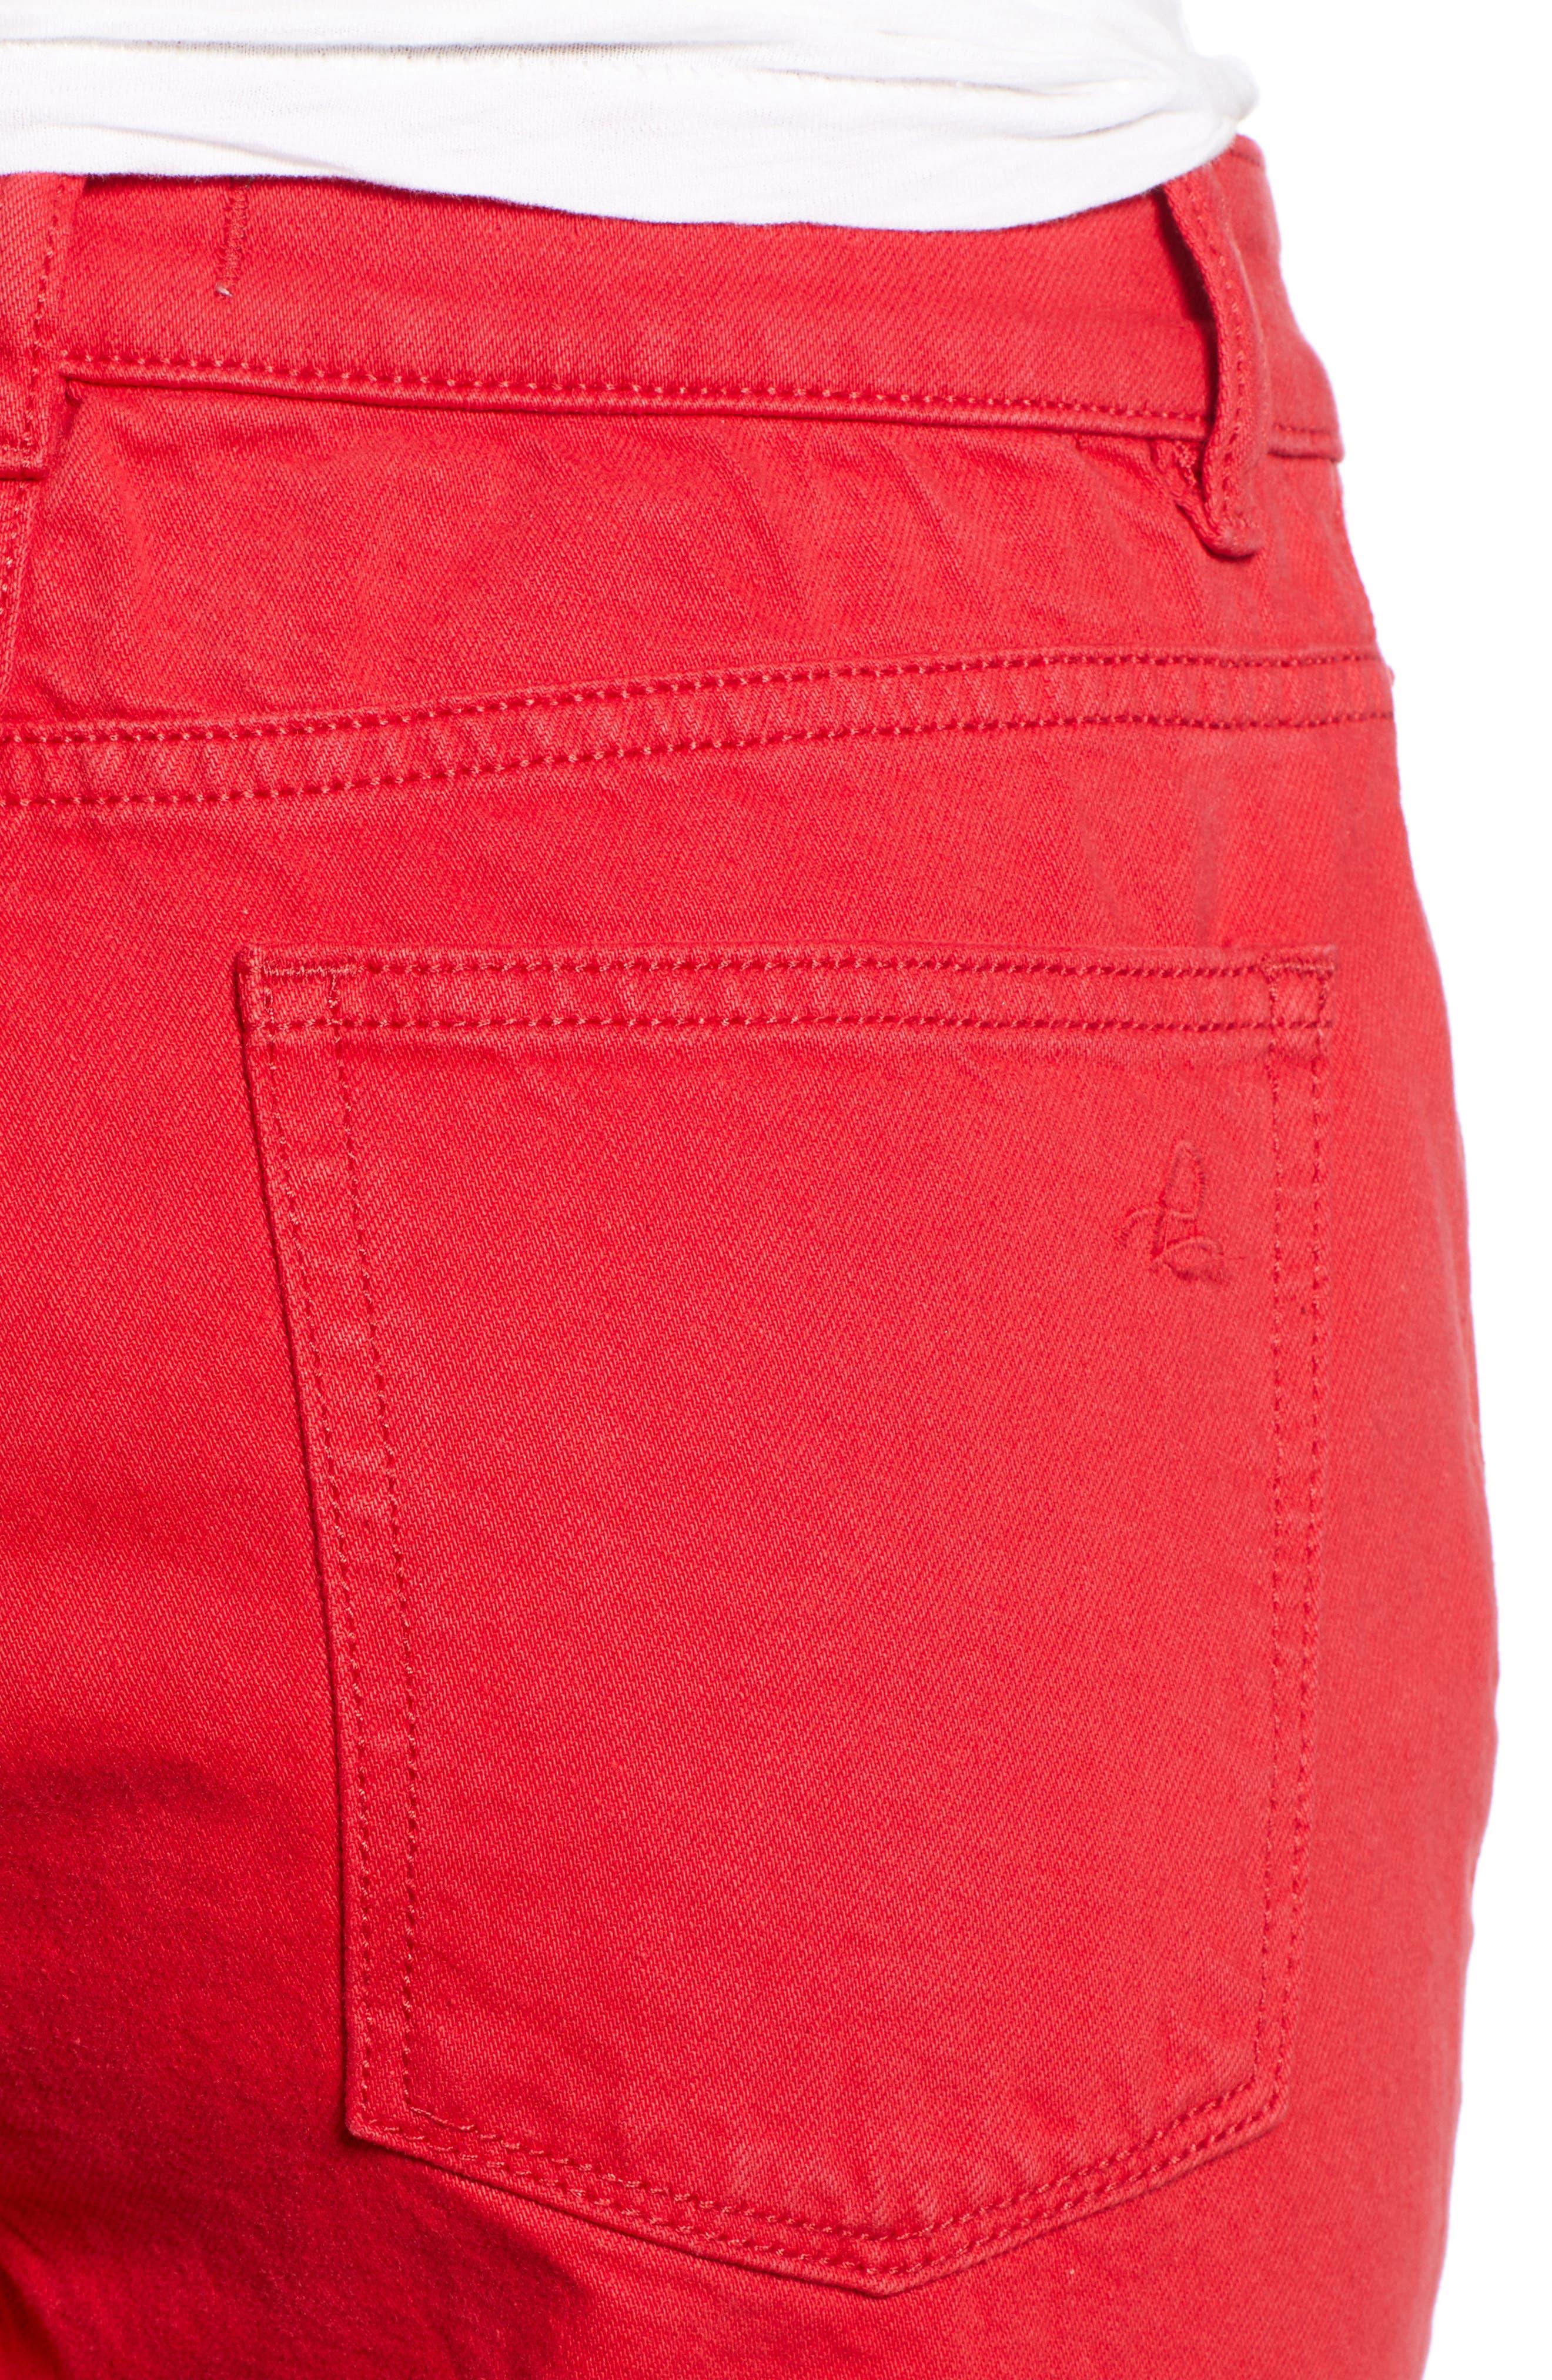 Jerry High Waist Straight Leg Jeans,                             Alternate thumbnail 4, color,                             600